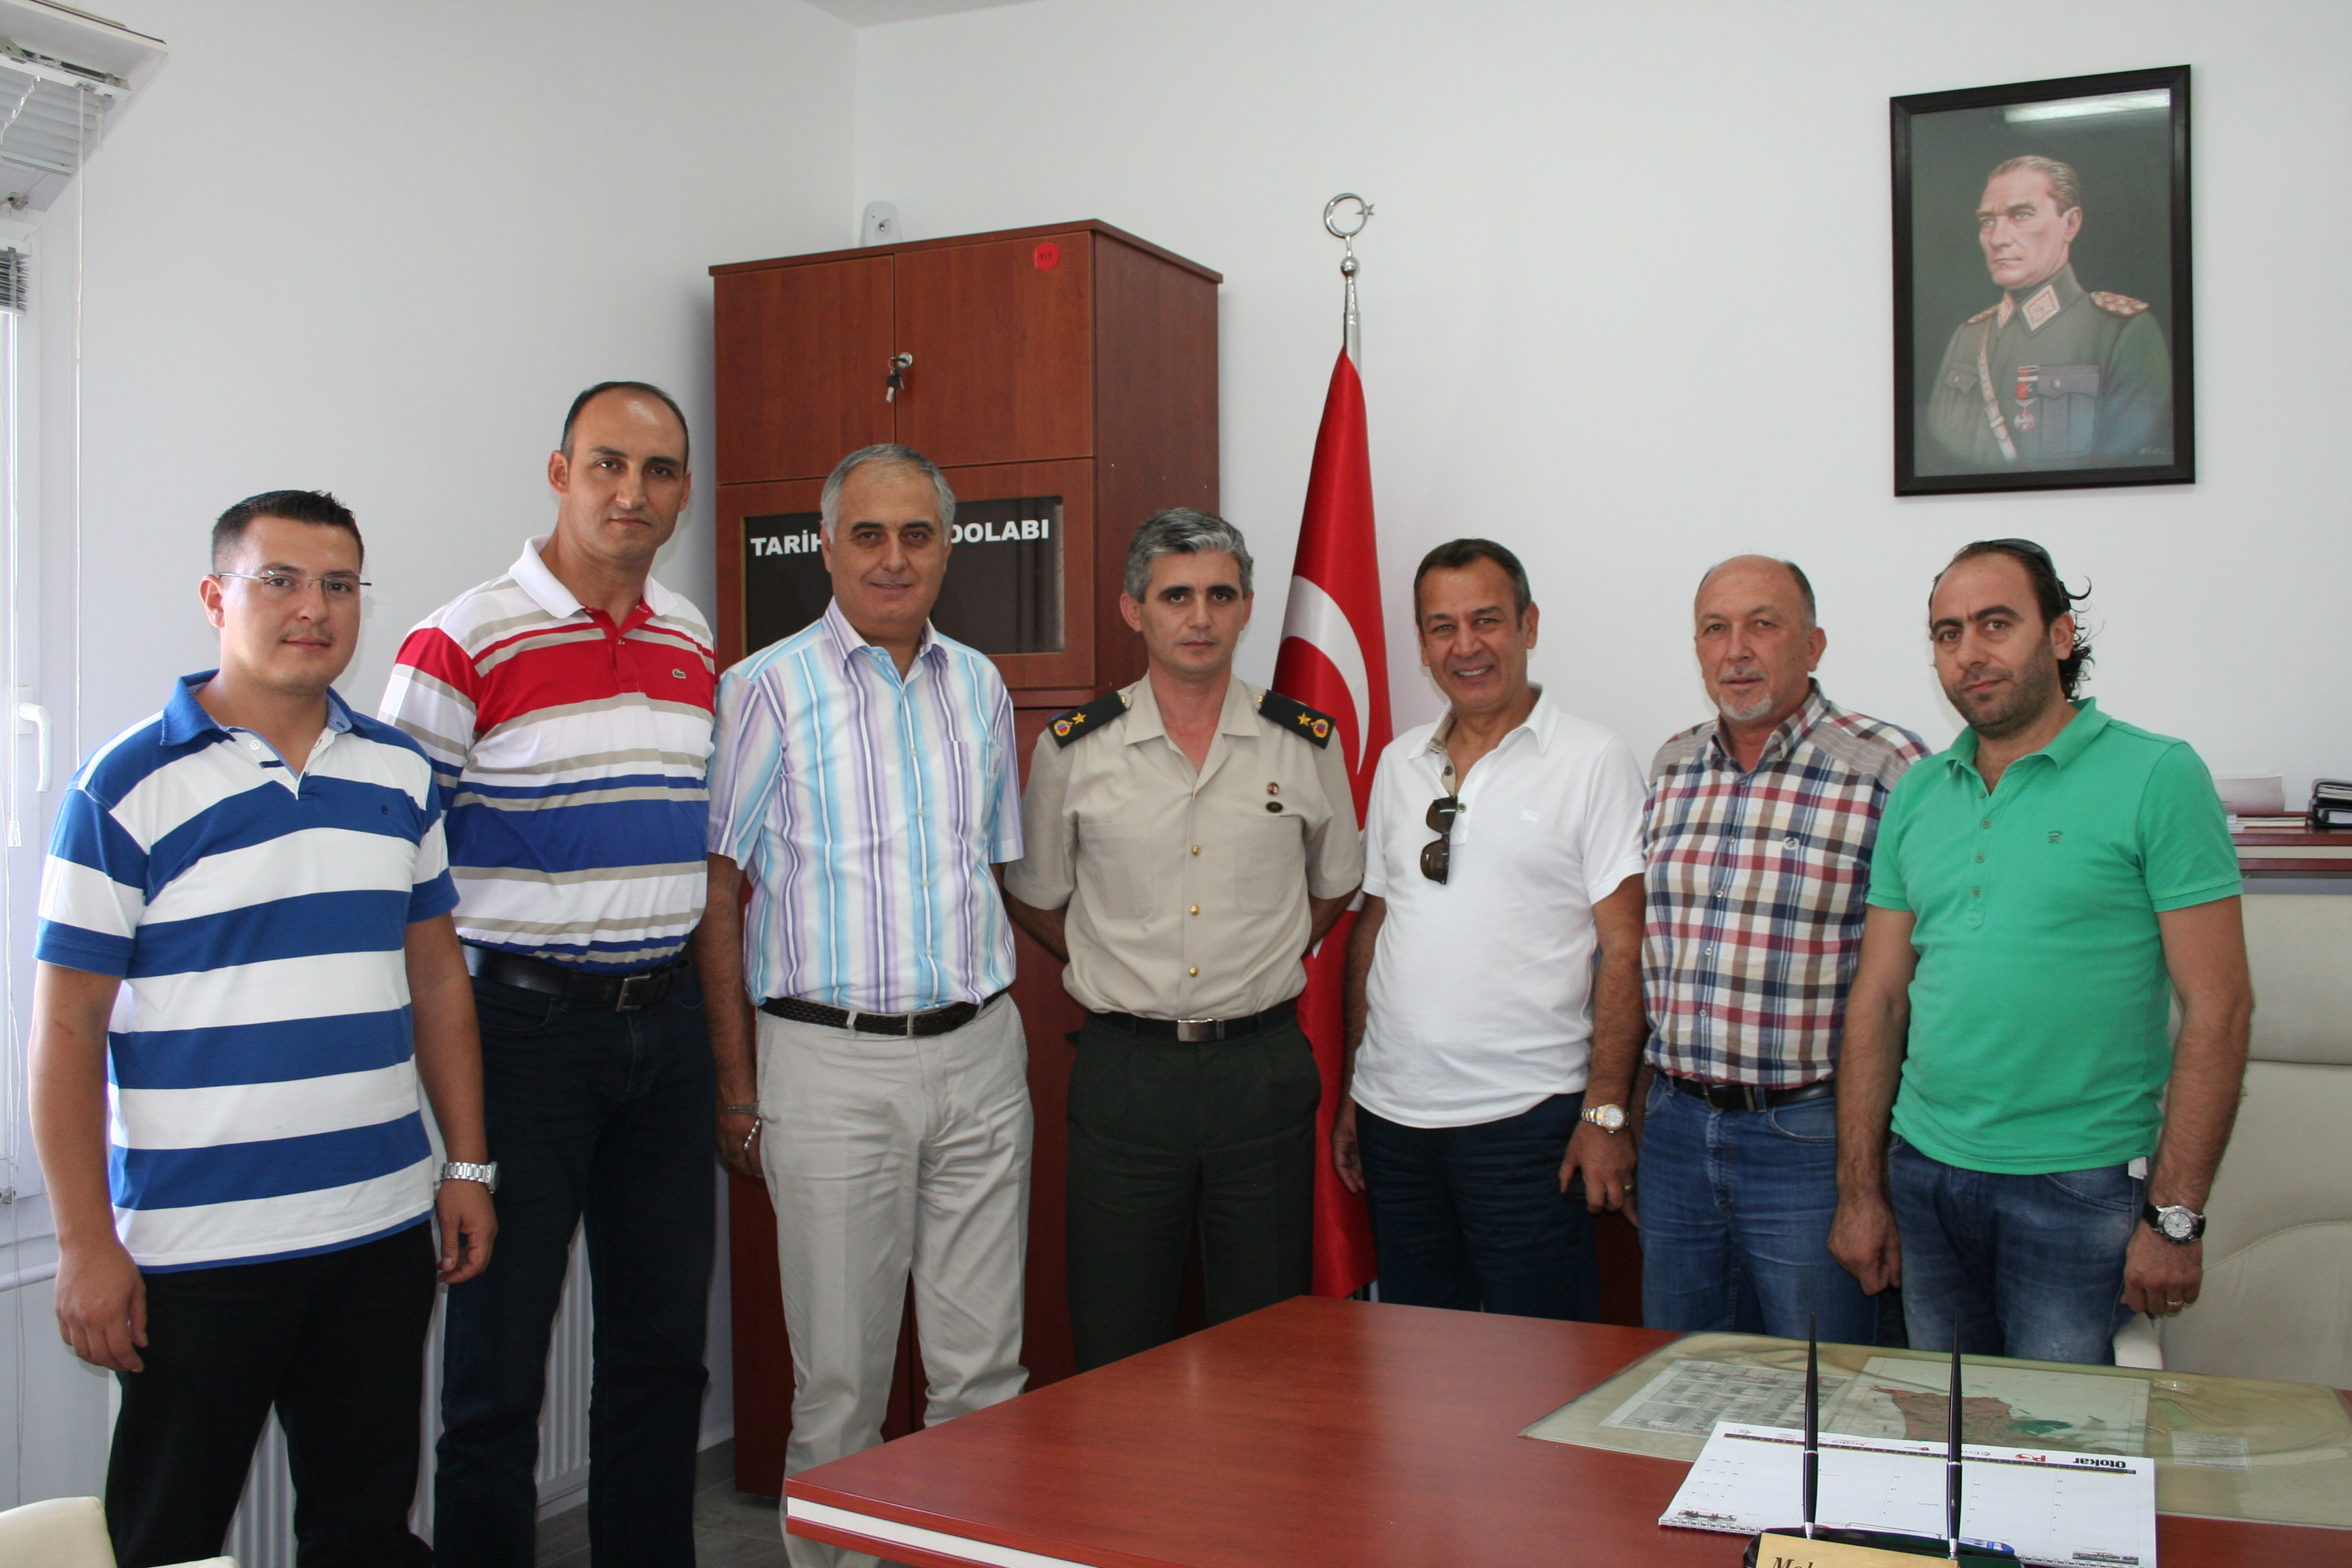 MİTSO Yönetimi, İlçe Jandarma Komutanı J. Bnb. Mehmet Atik'i ziyaret etti